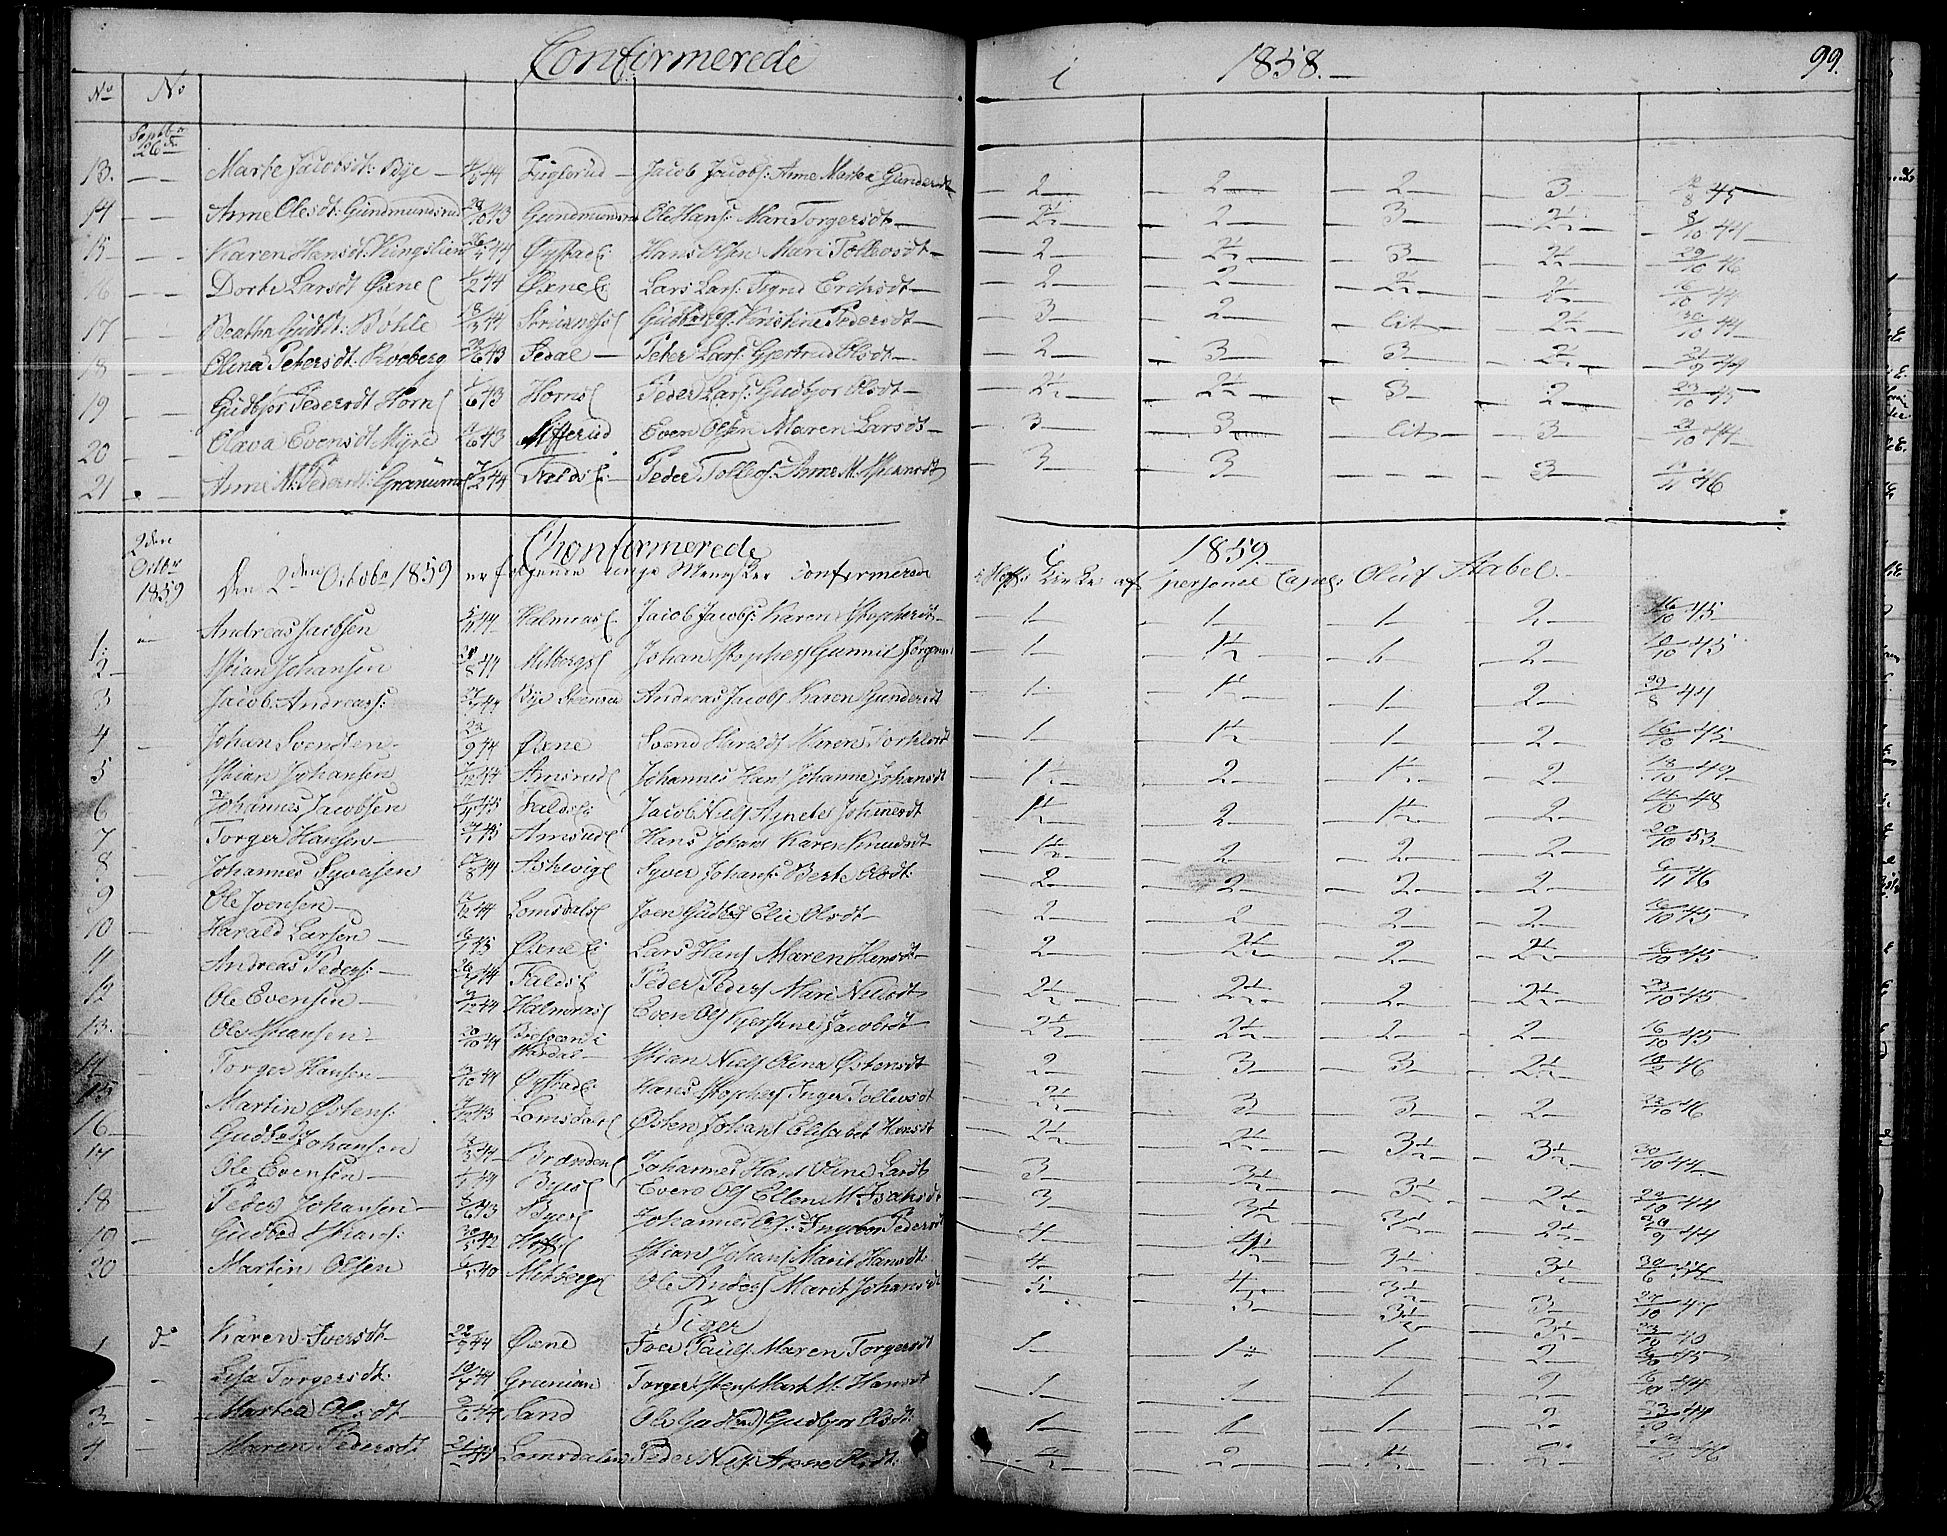 SAH, Søndre Land prestekontor, L/L0001: Klokkerbok nr. 1, 1849-1883, s. 99